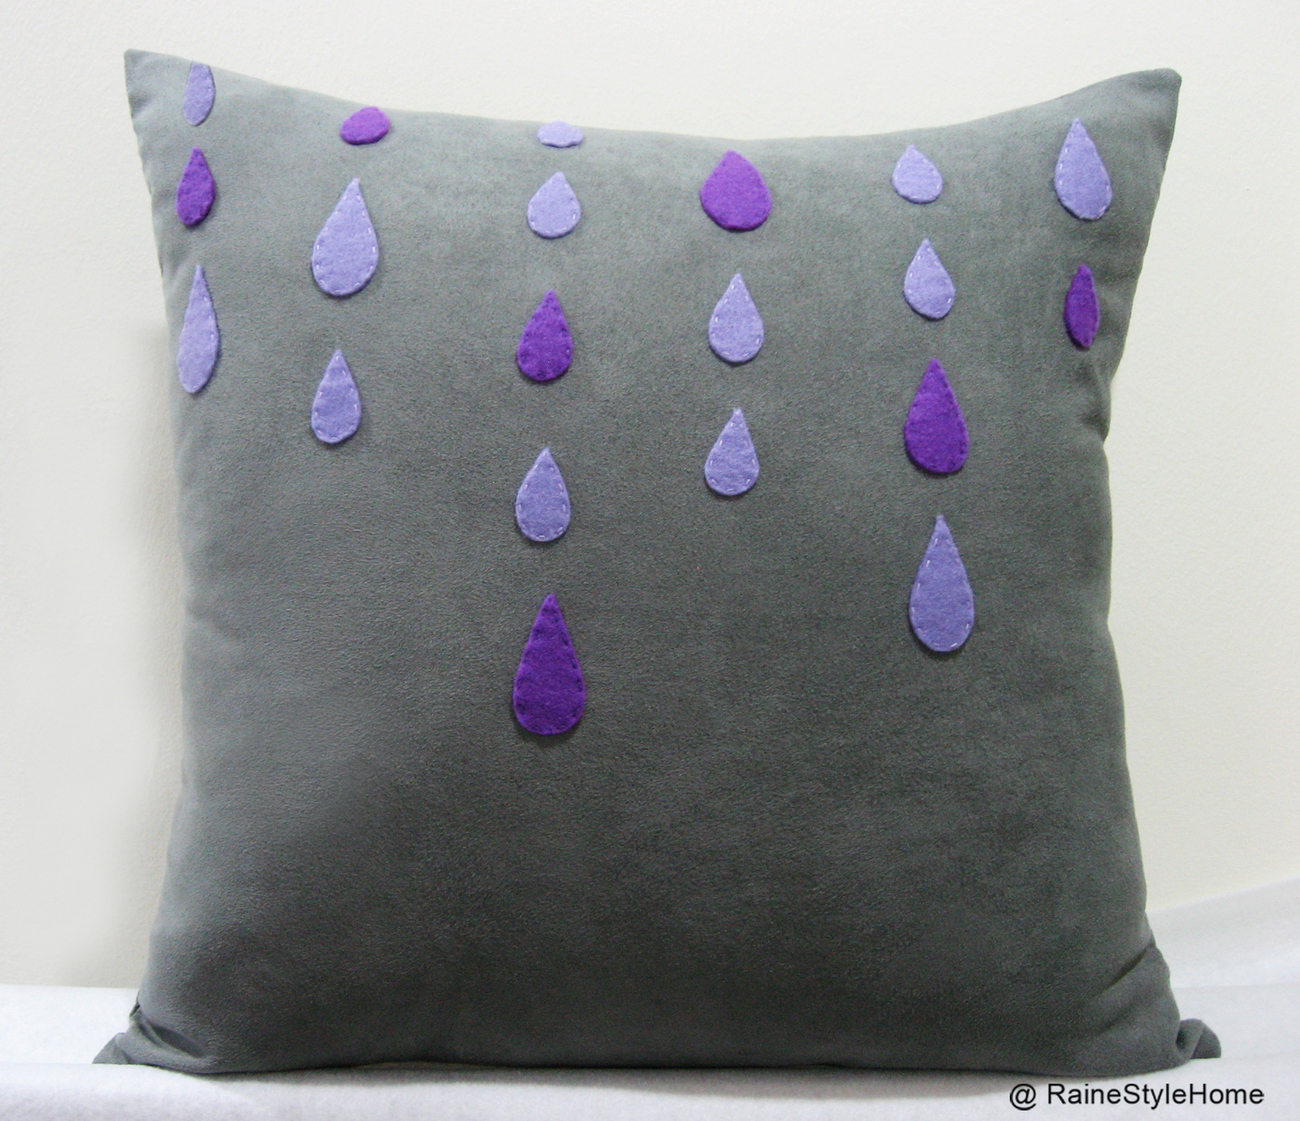 Purple And Gray Decorative Pillows : Purple Rain Grey Rainy Days Grey Pillow Cover. Modern Decorative Raindrops - Pillows